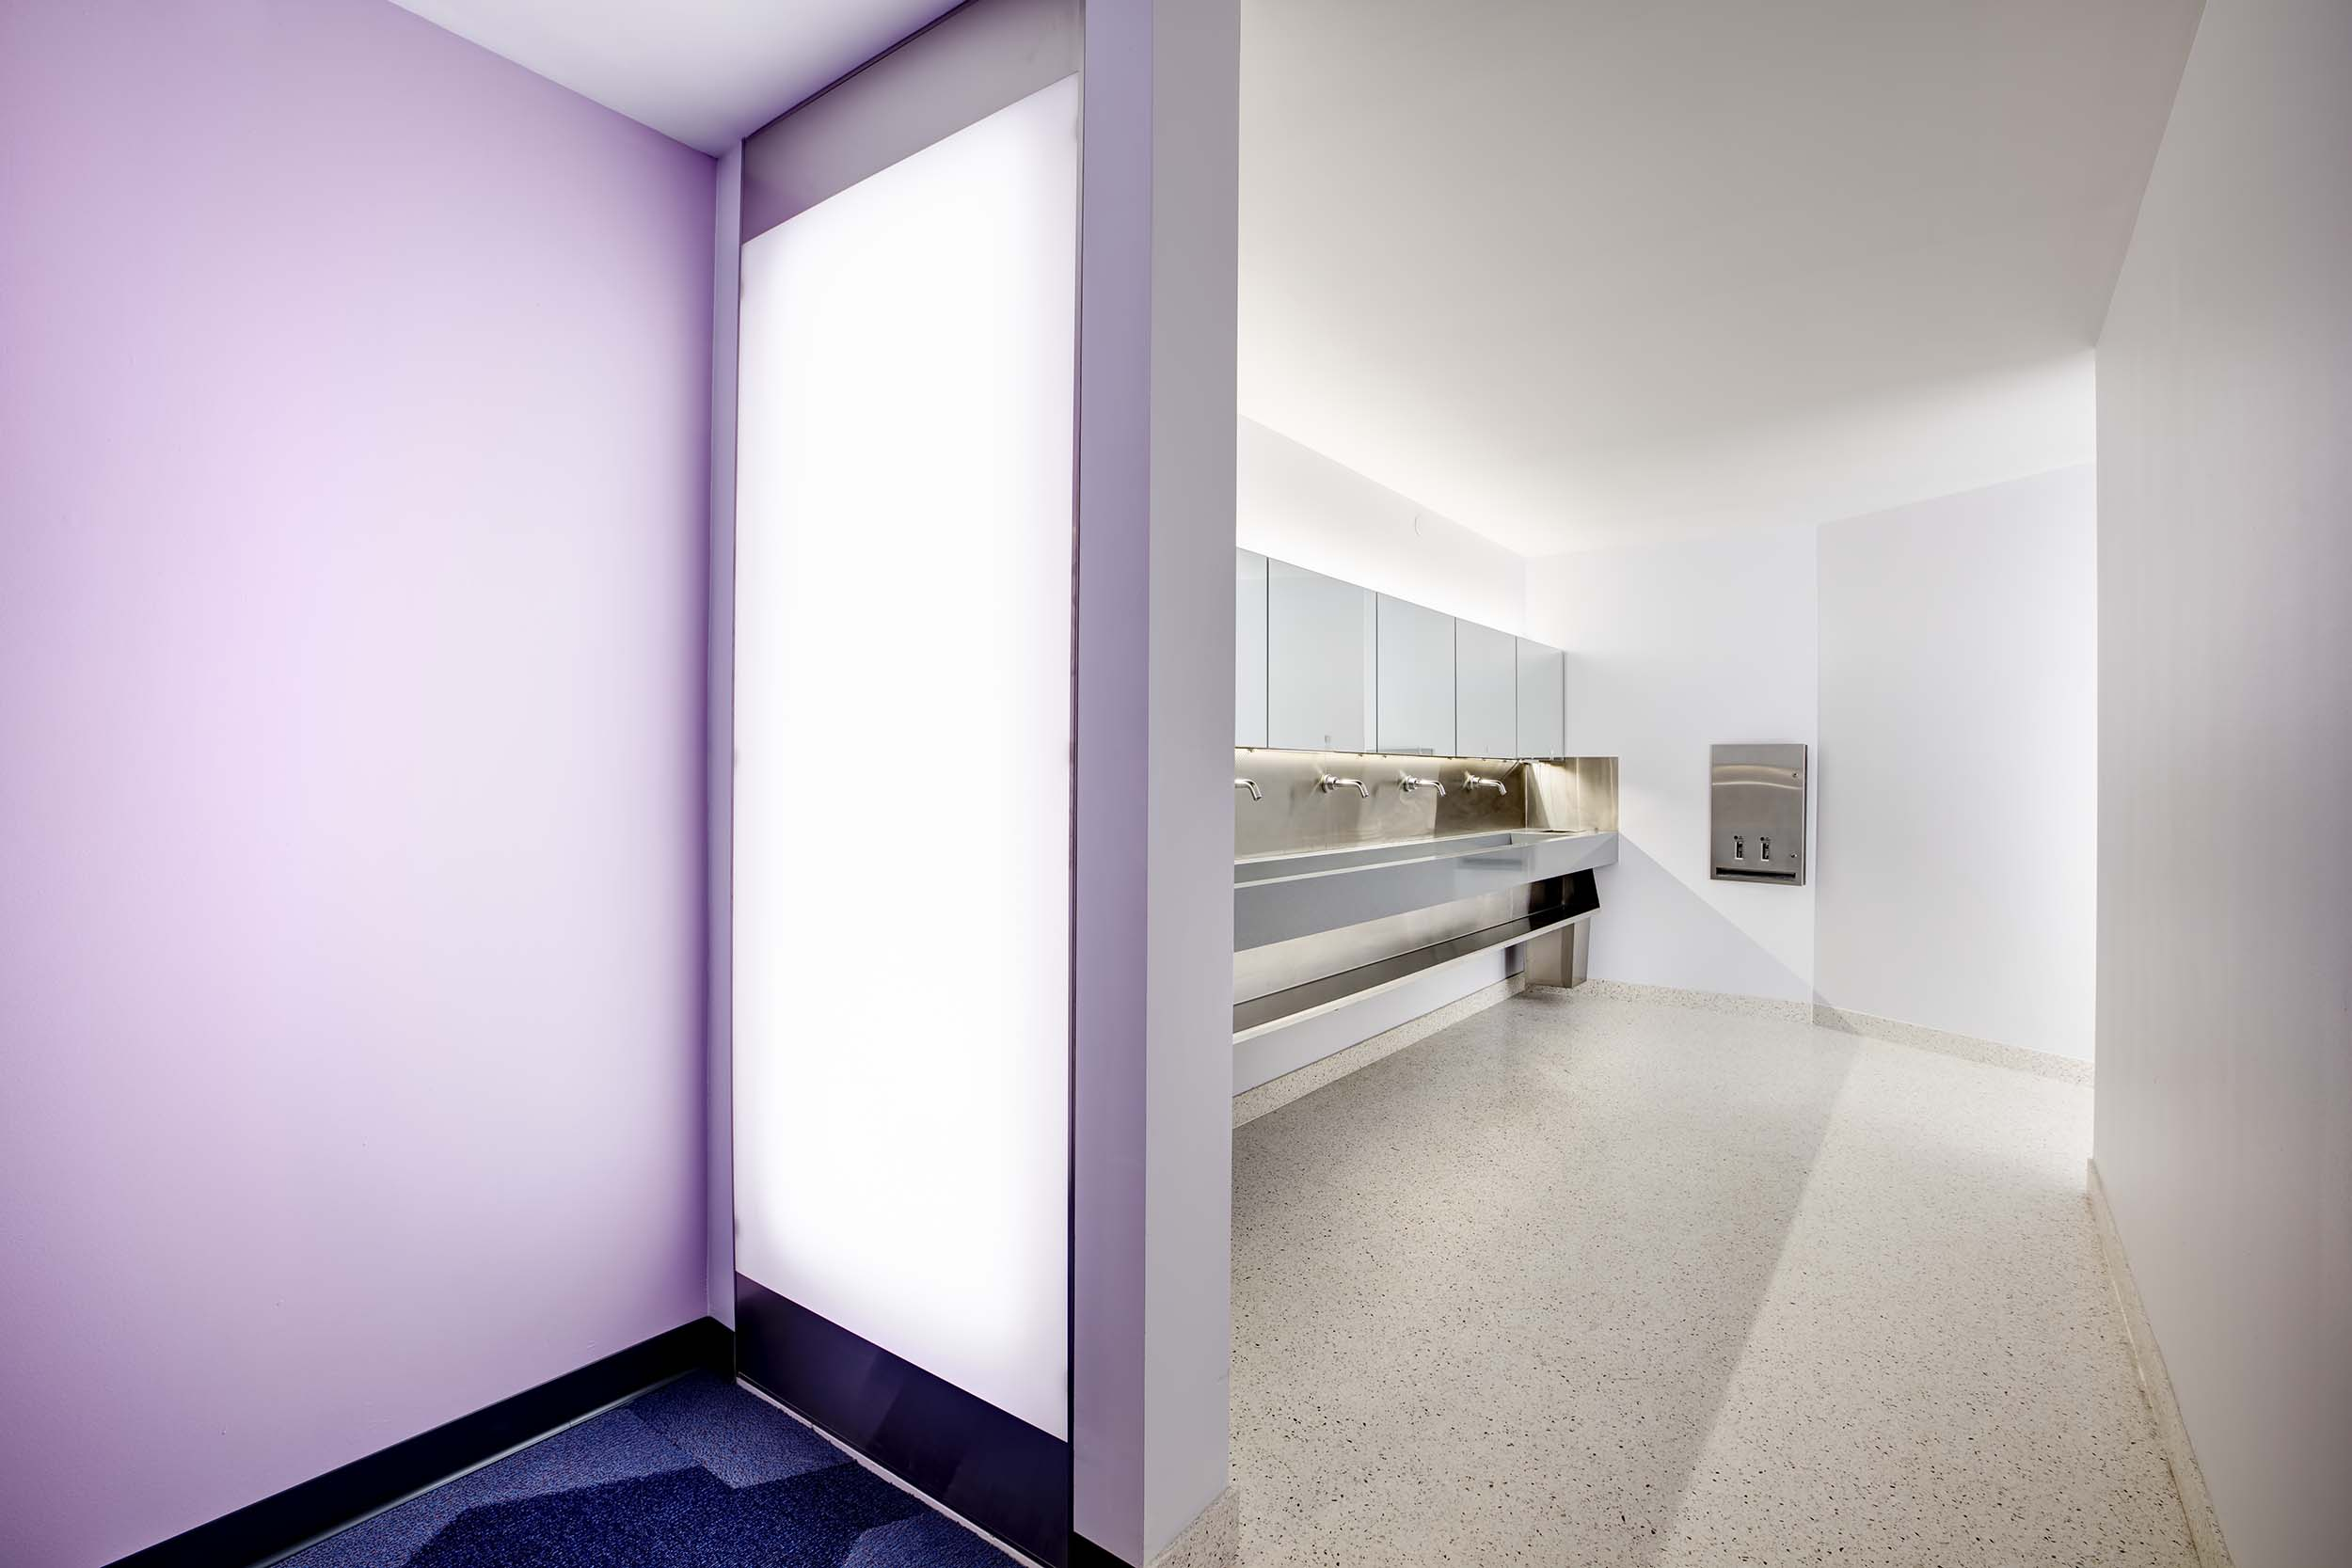 Solstice_Architects_Van_Wezel_01.jpg